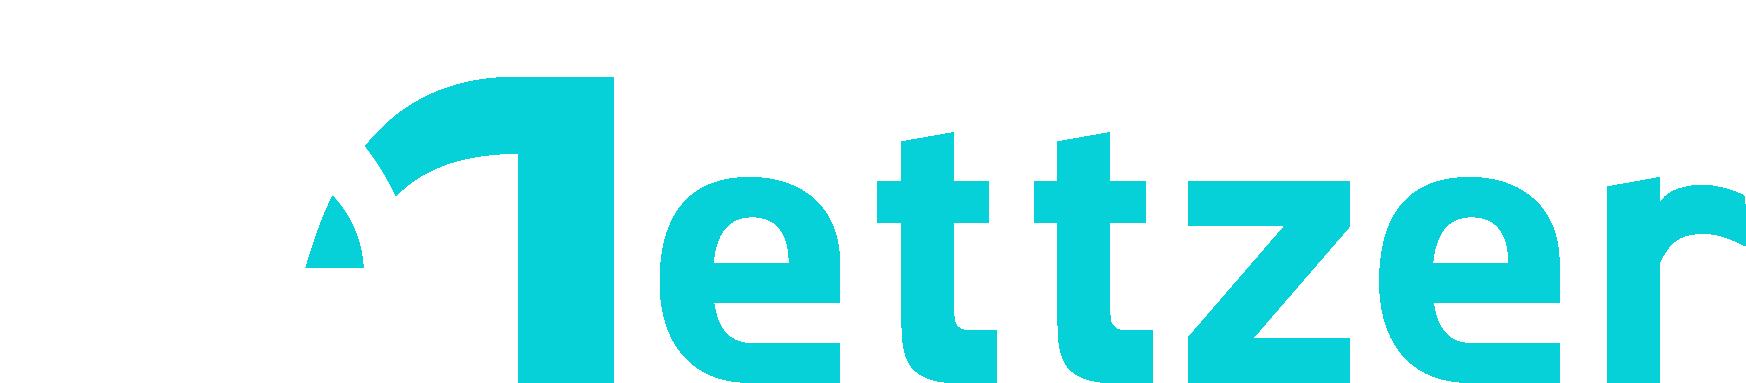 Mettzer_logo_azul_01